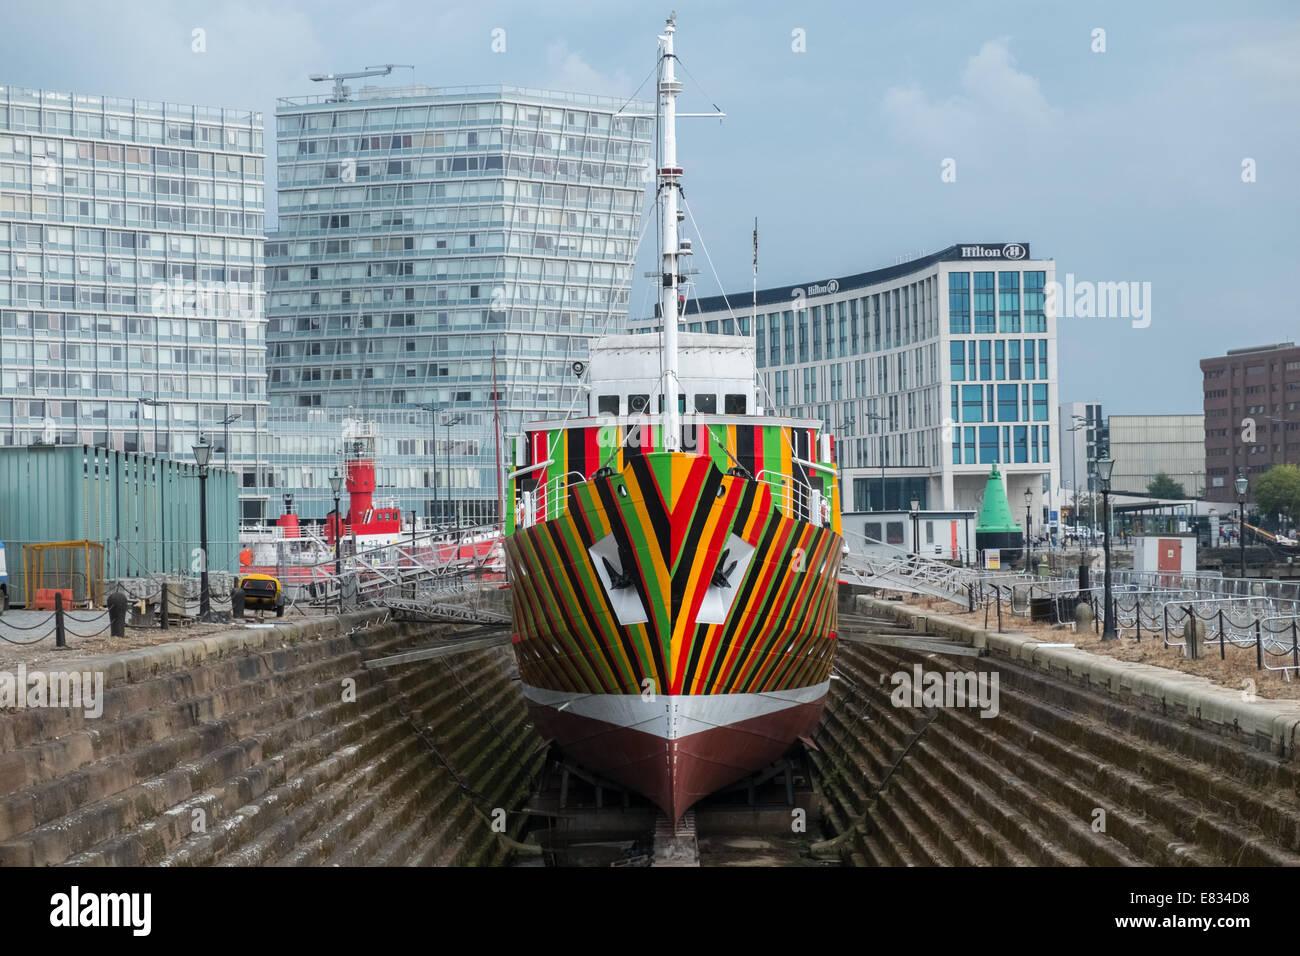 Liverpool Biennial 2014, artist Carlos Cruz-Diez created Dazzle Ship, Albert Dock, Liverpool, Merseyside, England - Stock Image